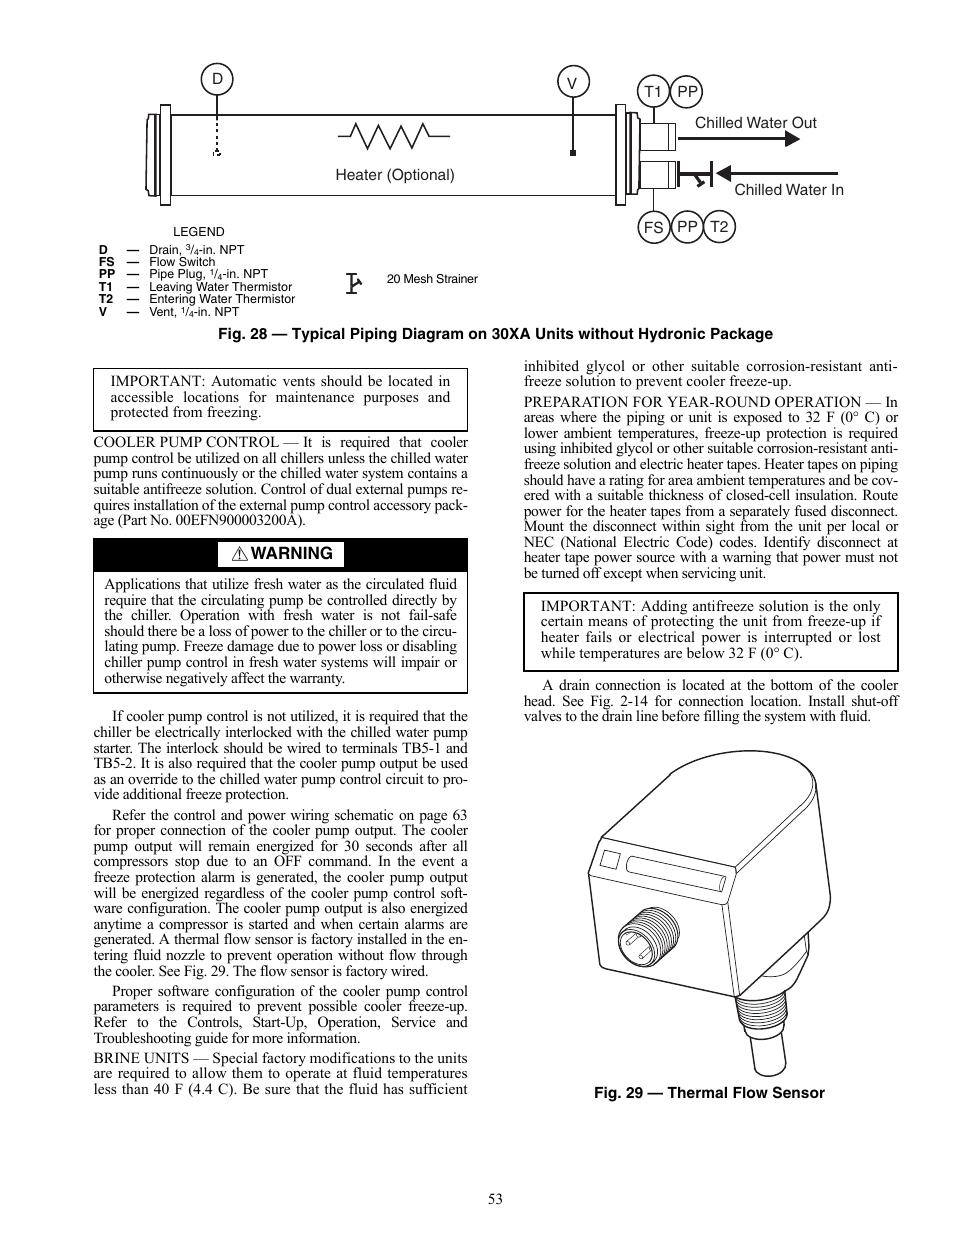 carrier chiller wiring diagram wiring diagrams mashups co Wesco Furnace Wiring Diagram carrier chiller wiring diagram 72 wesco electric furnace wiring diagram